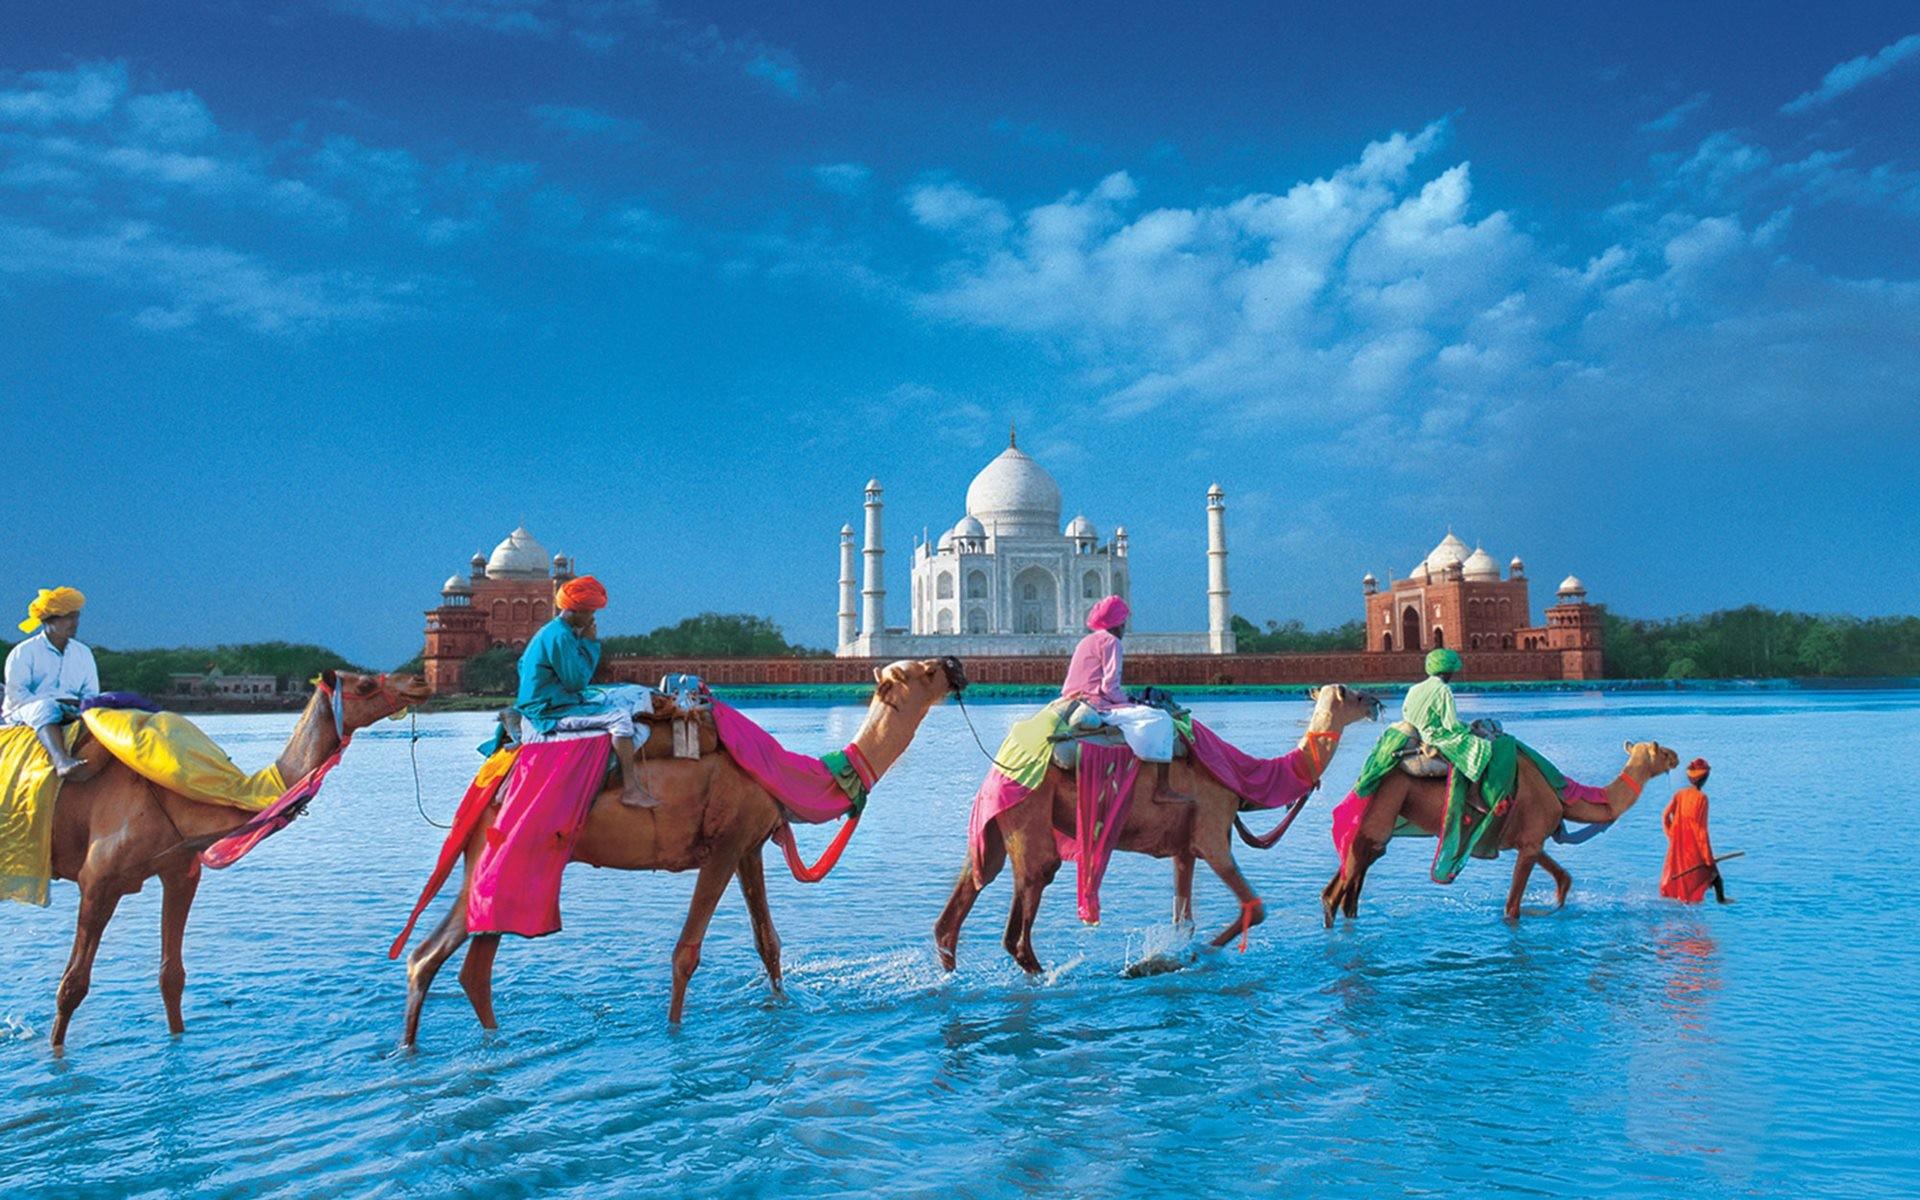 Hd wallpaper india - Taj Mahal India Desktop Background New Hd Wallpapers